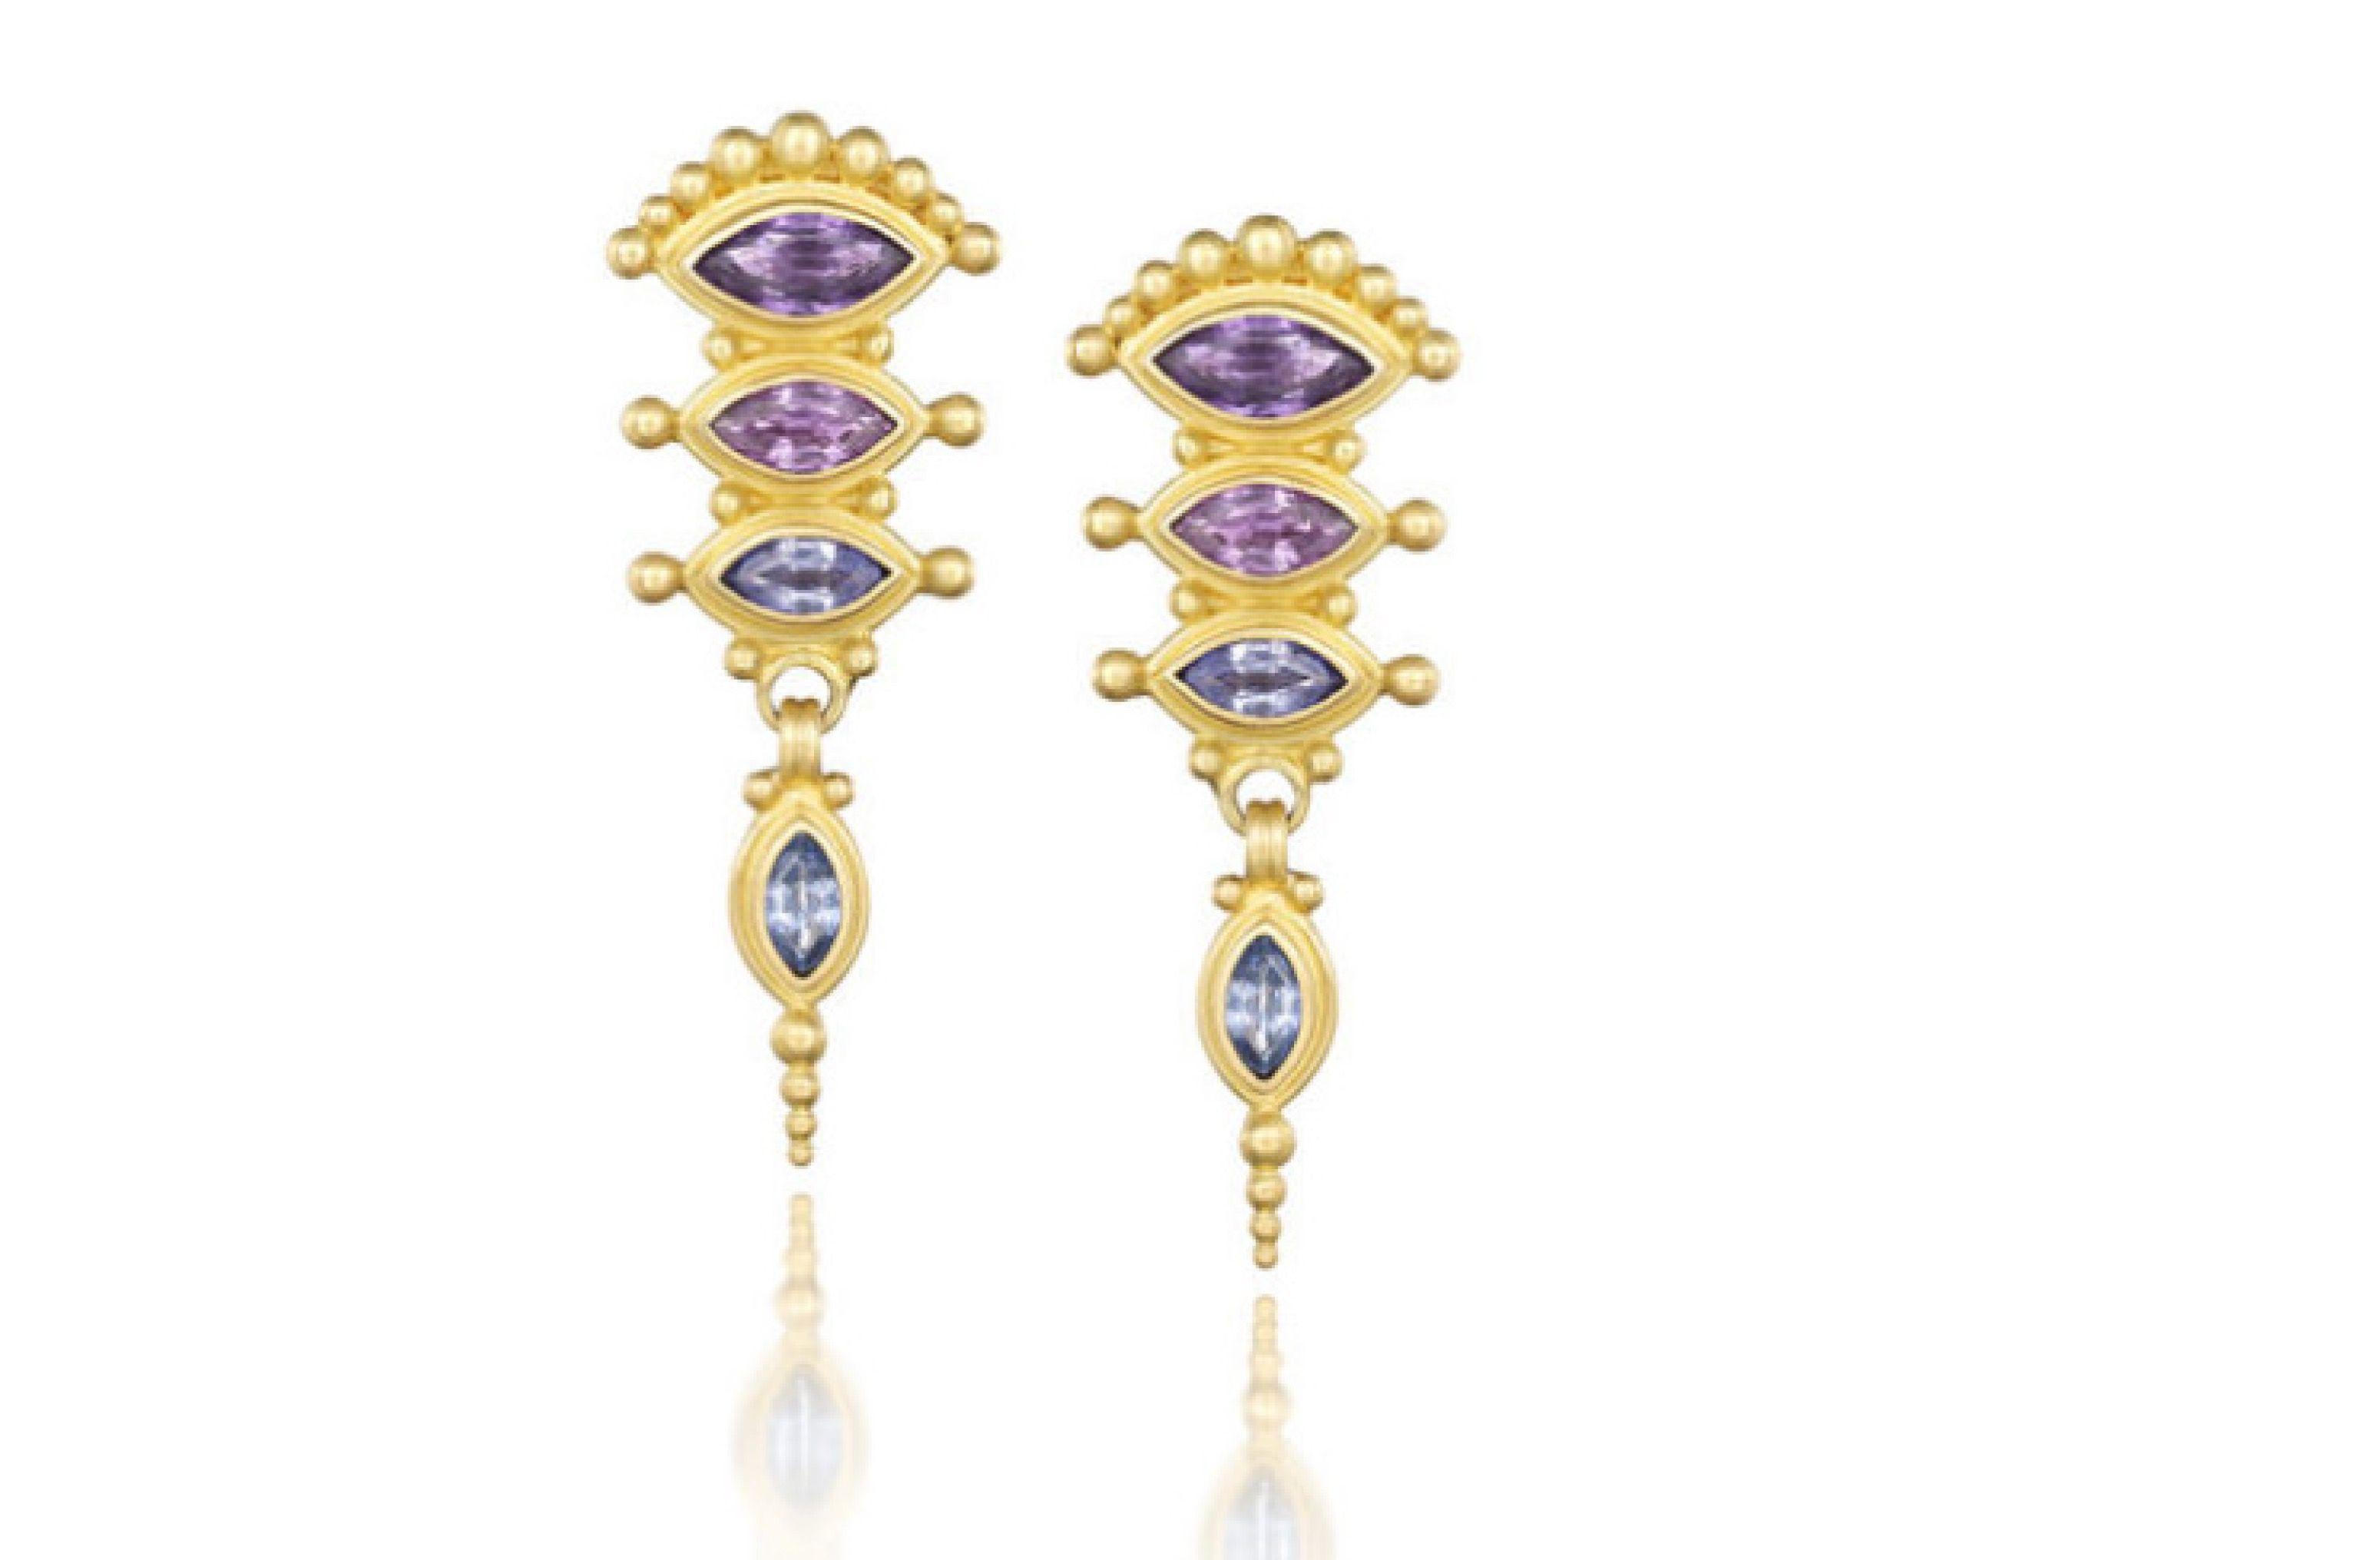 JewelryWhite_06.jpg